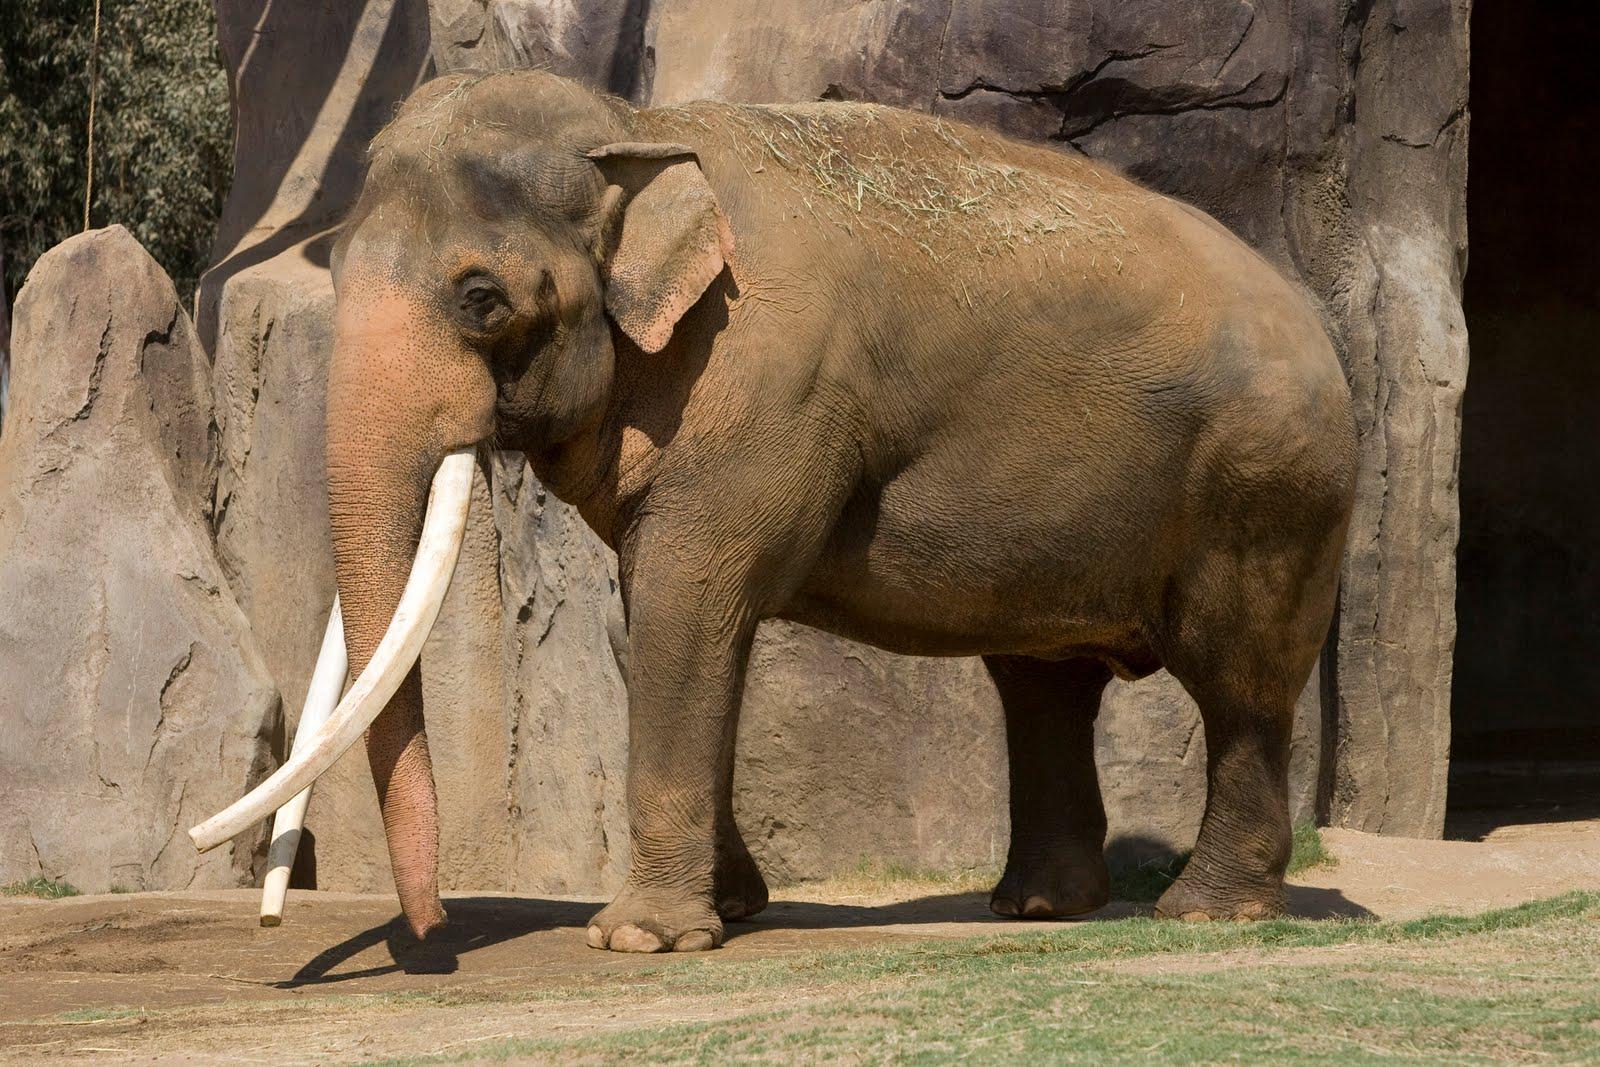 asian elephant endangered article jpg 422x640